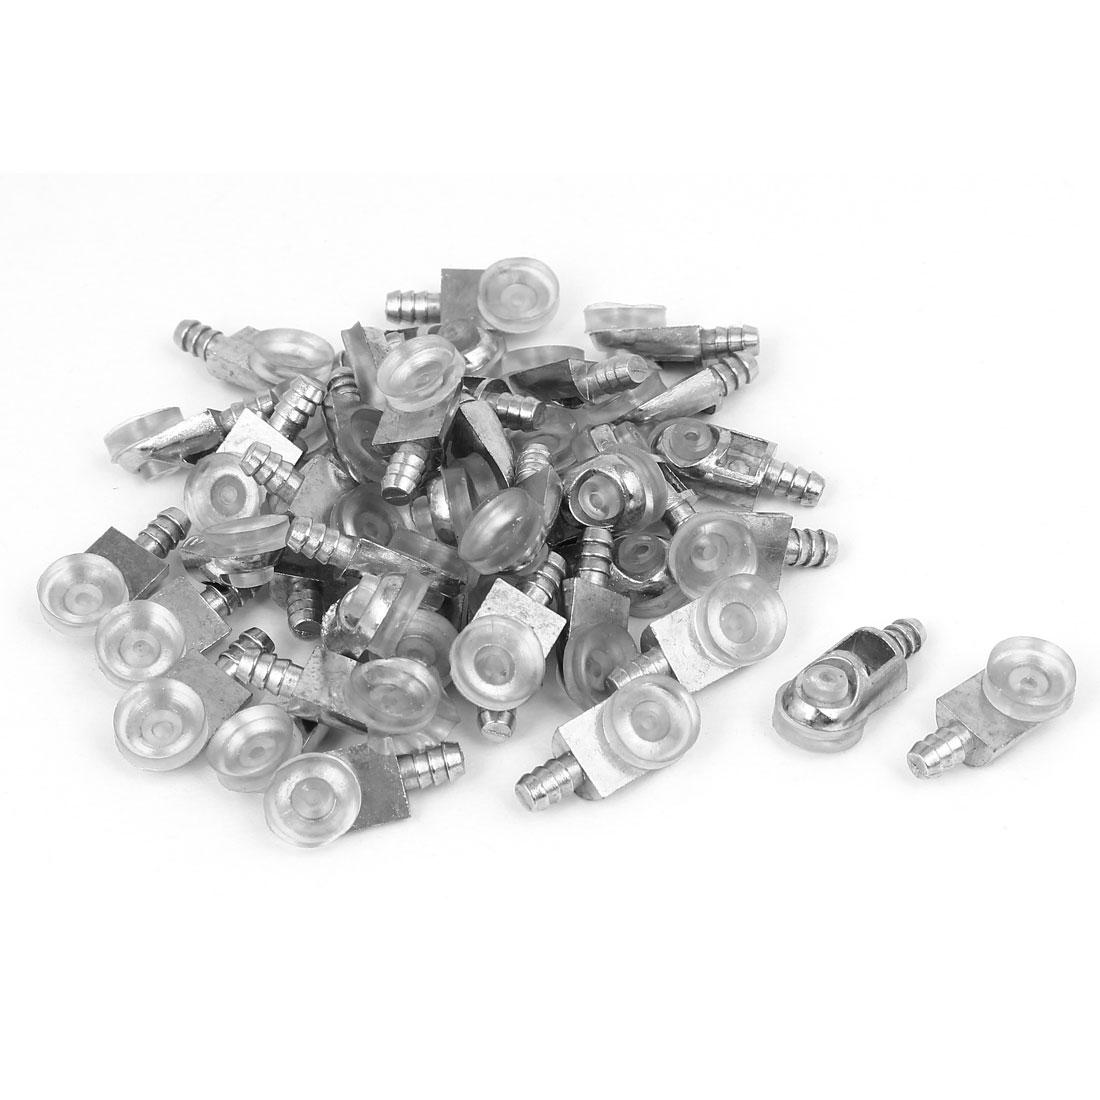 5mm Pin Dia 13mm Diameter Suction Cup Metal Shelf Support Holder Bracket 40pcs